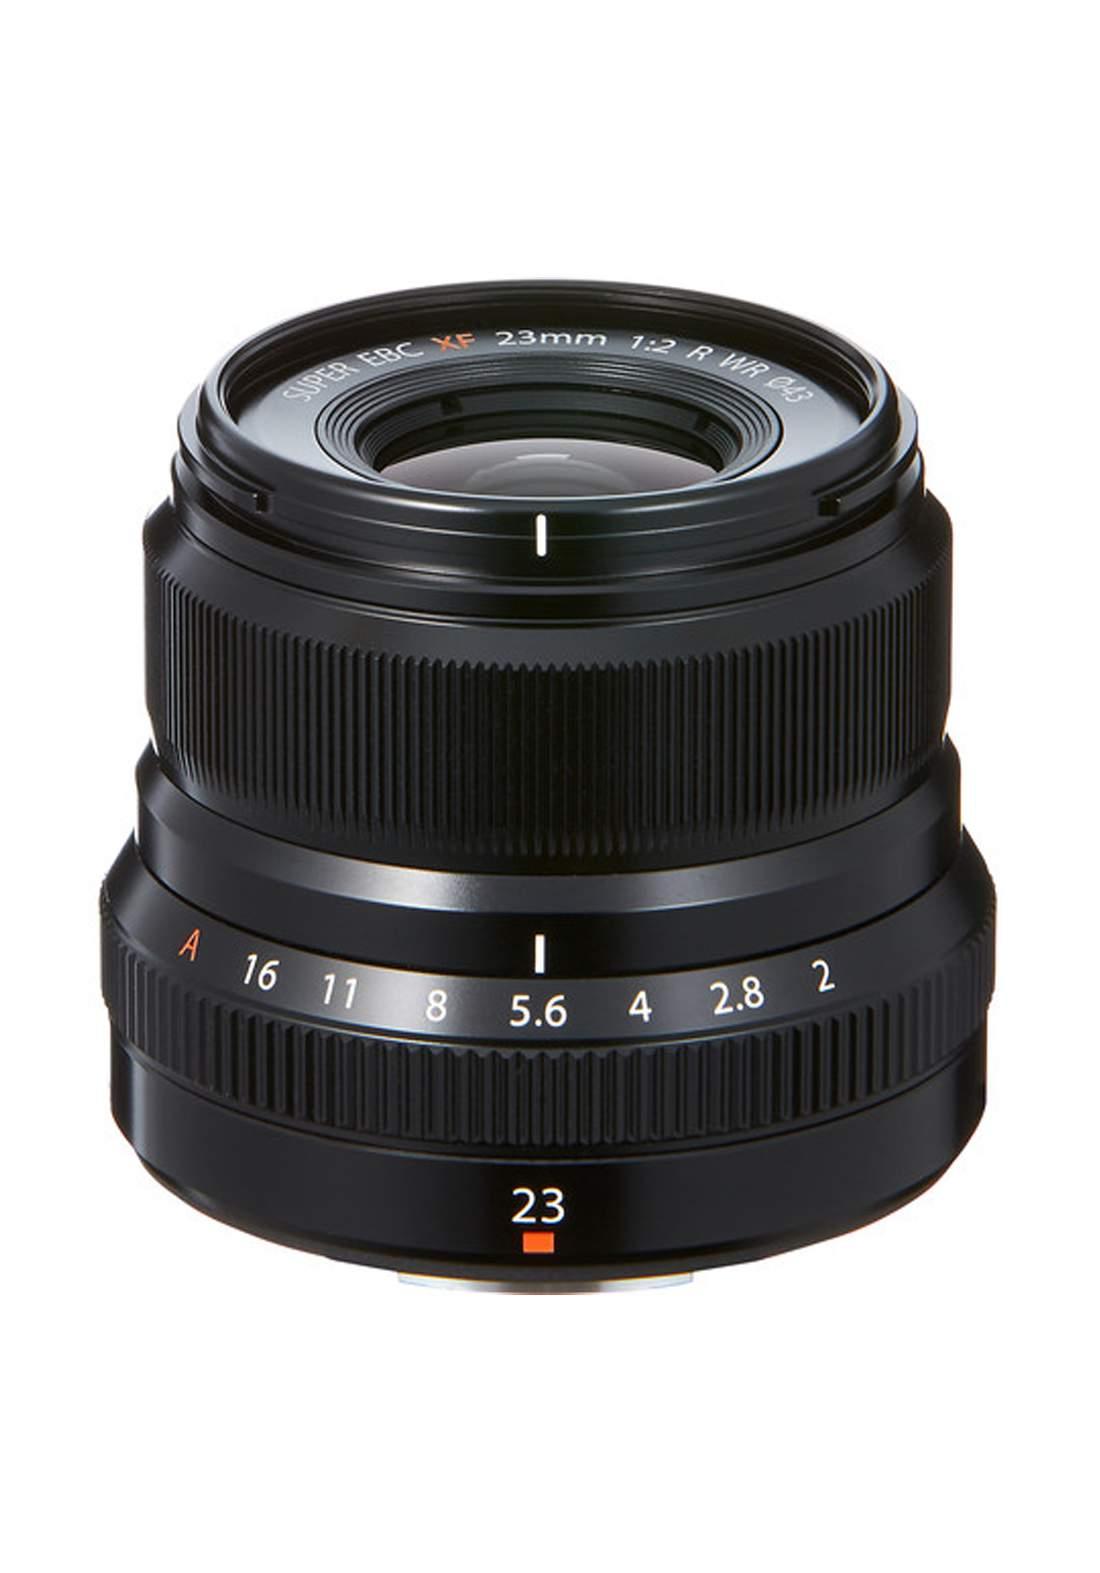 Fujifilm XF 23mm F2 R WR Lens  - Black عدسة كاميرا